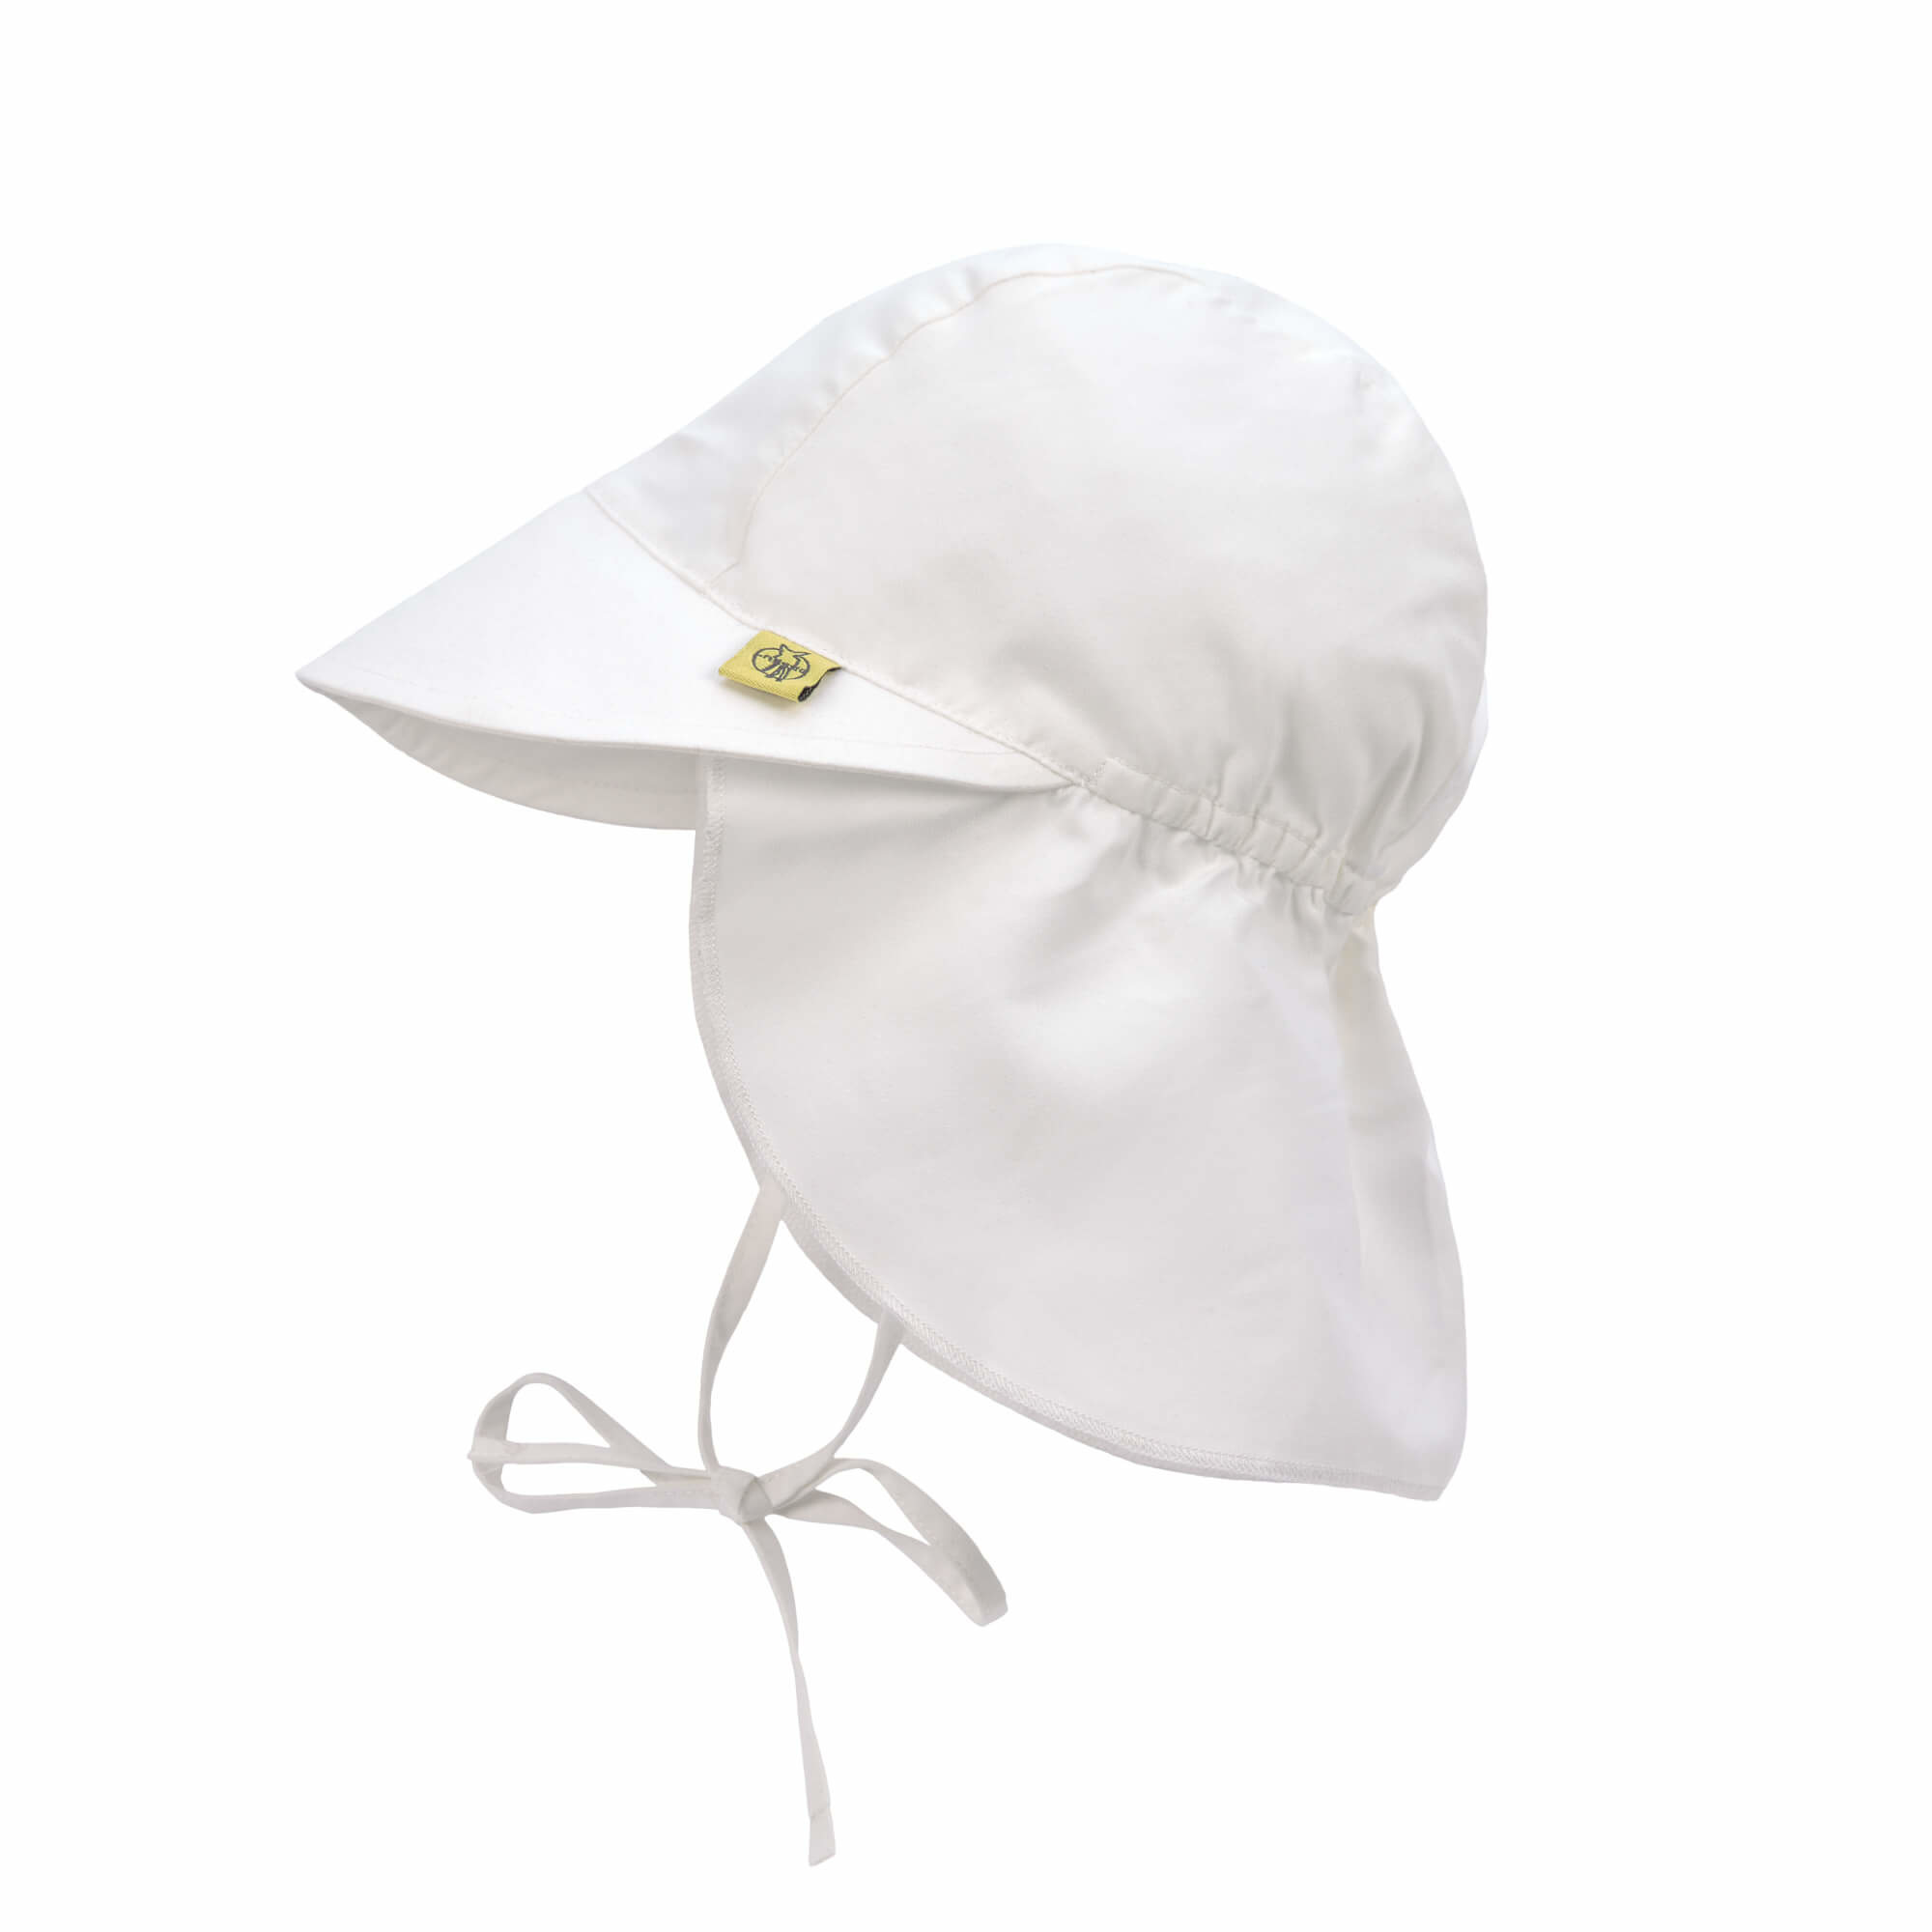 LASSIG Sun Protection Flap Hat - White